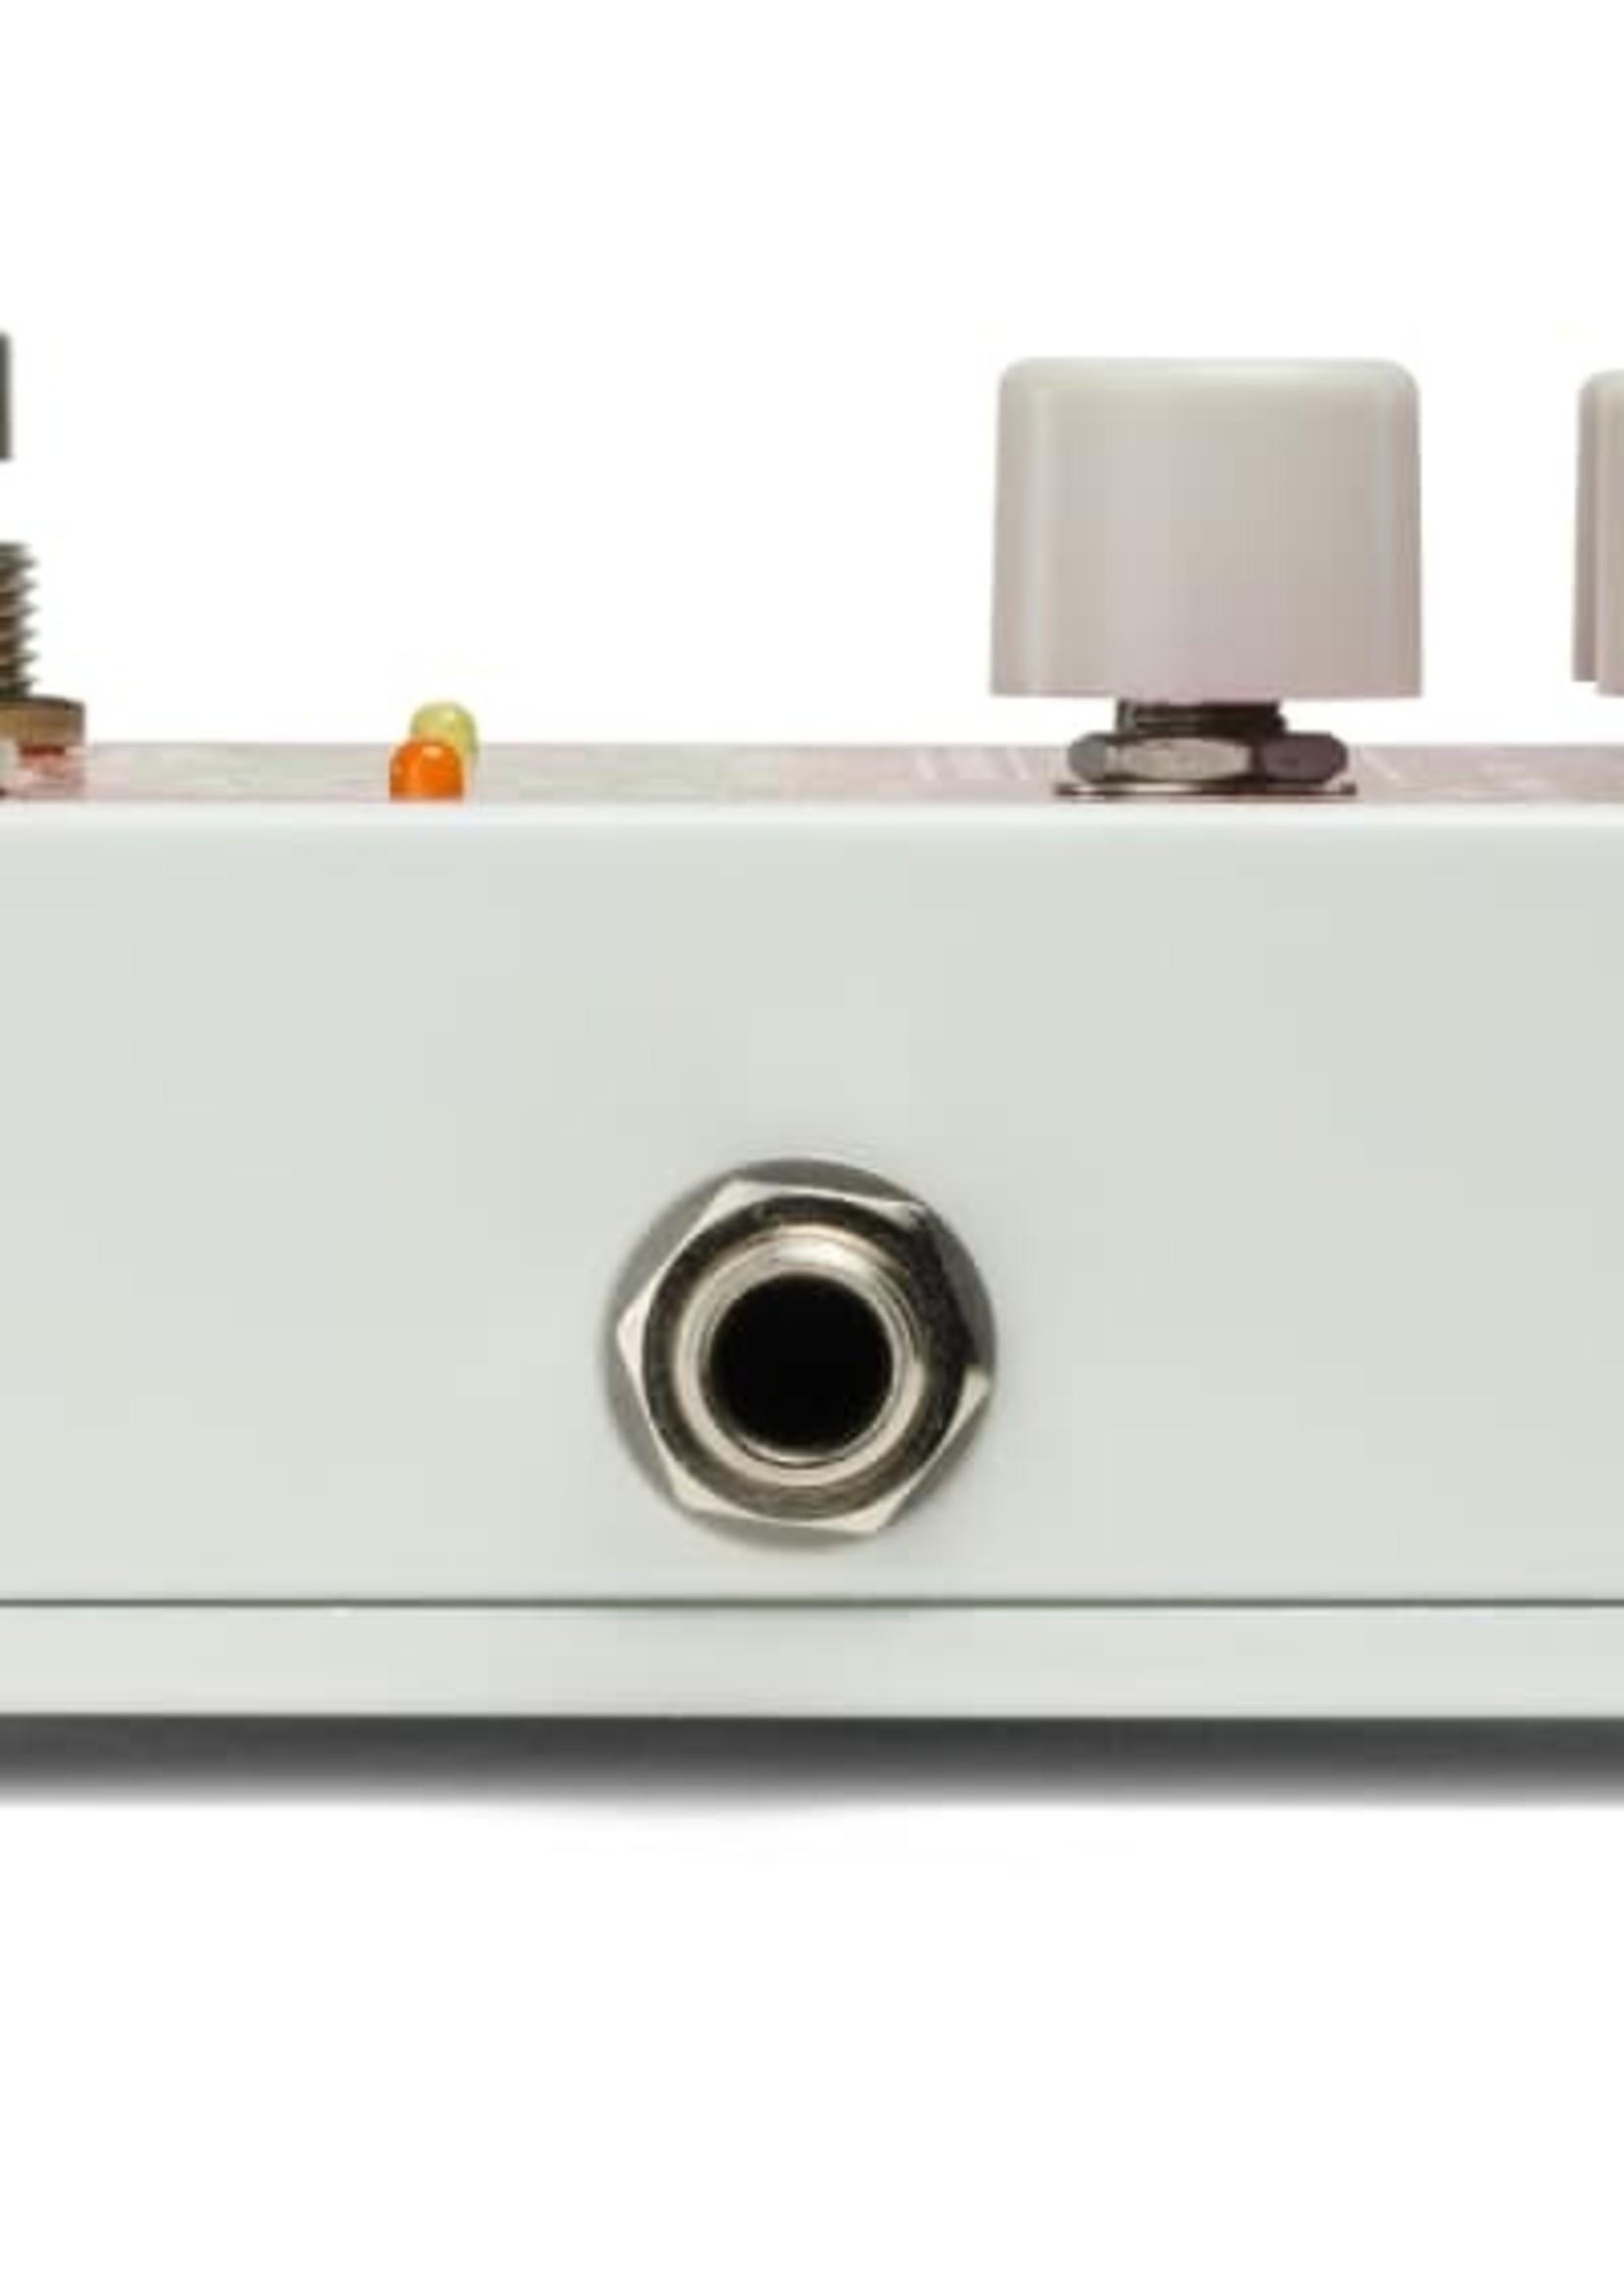 Electro-Harmonix Electro-Harmonix Blurst Modulated Filter Pedal